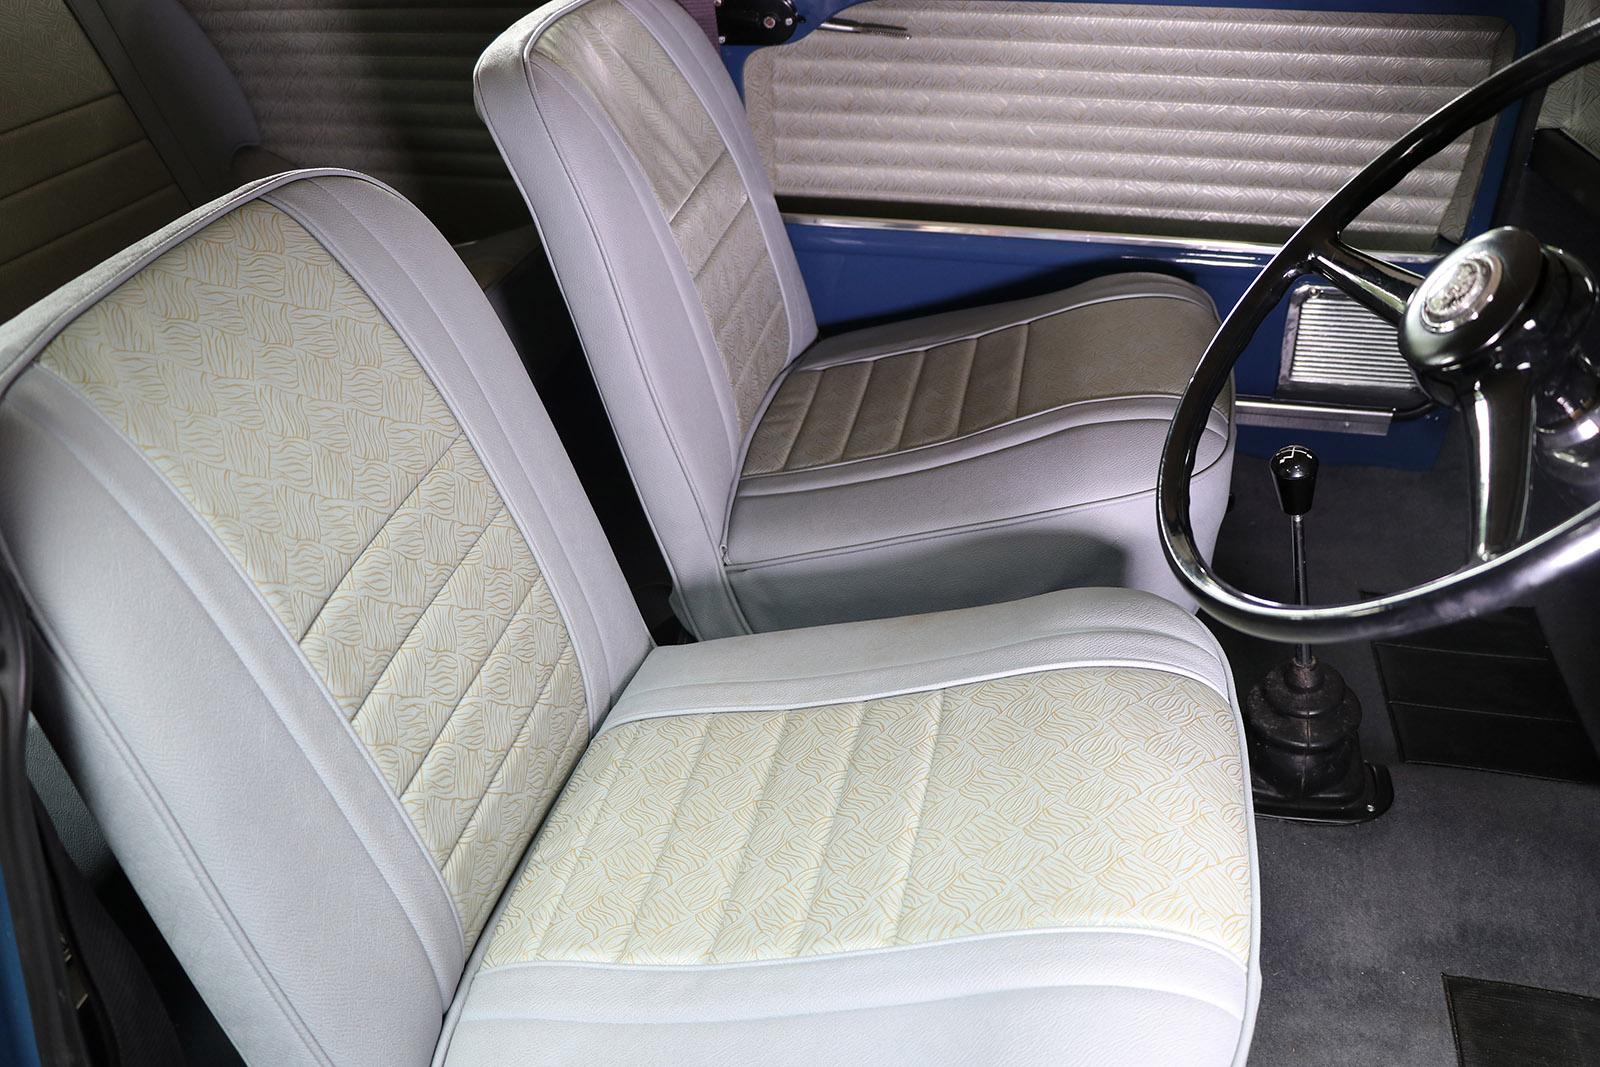 1967 blue 1275 Mini Cooper S Sayer Selection Wilkinson 23 web.jpg